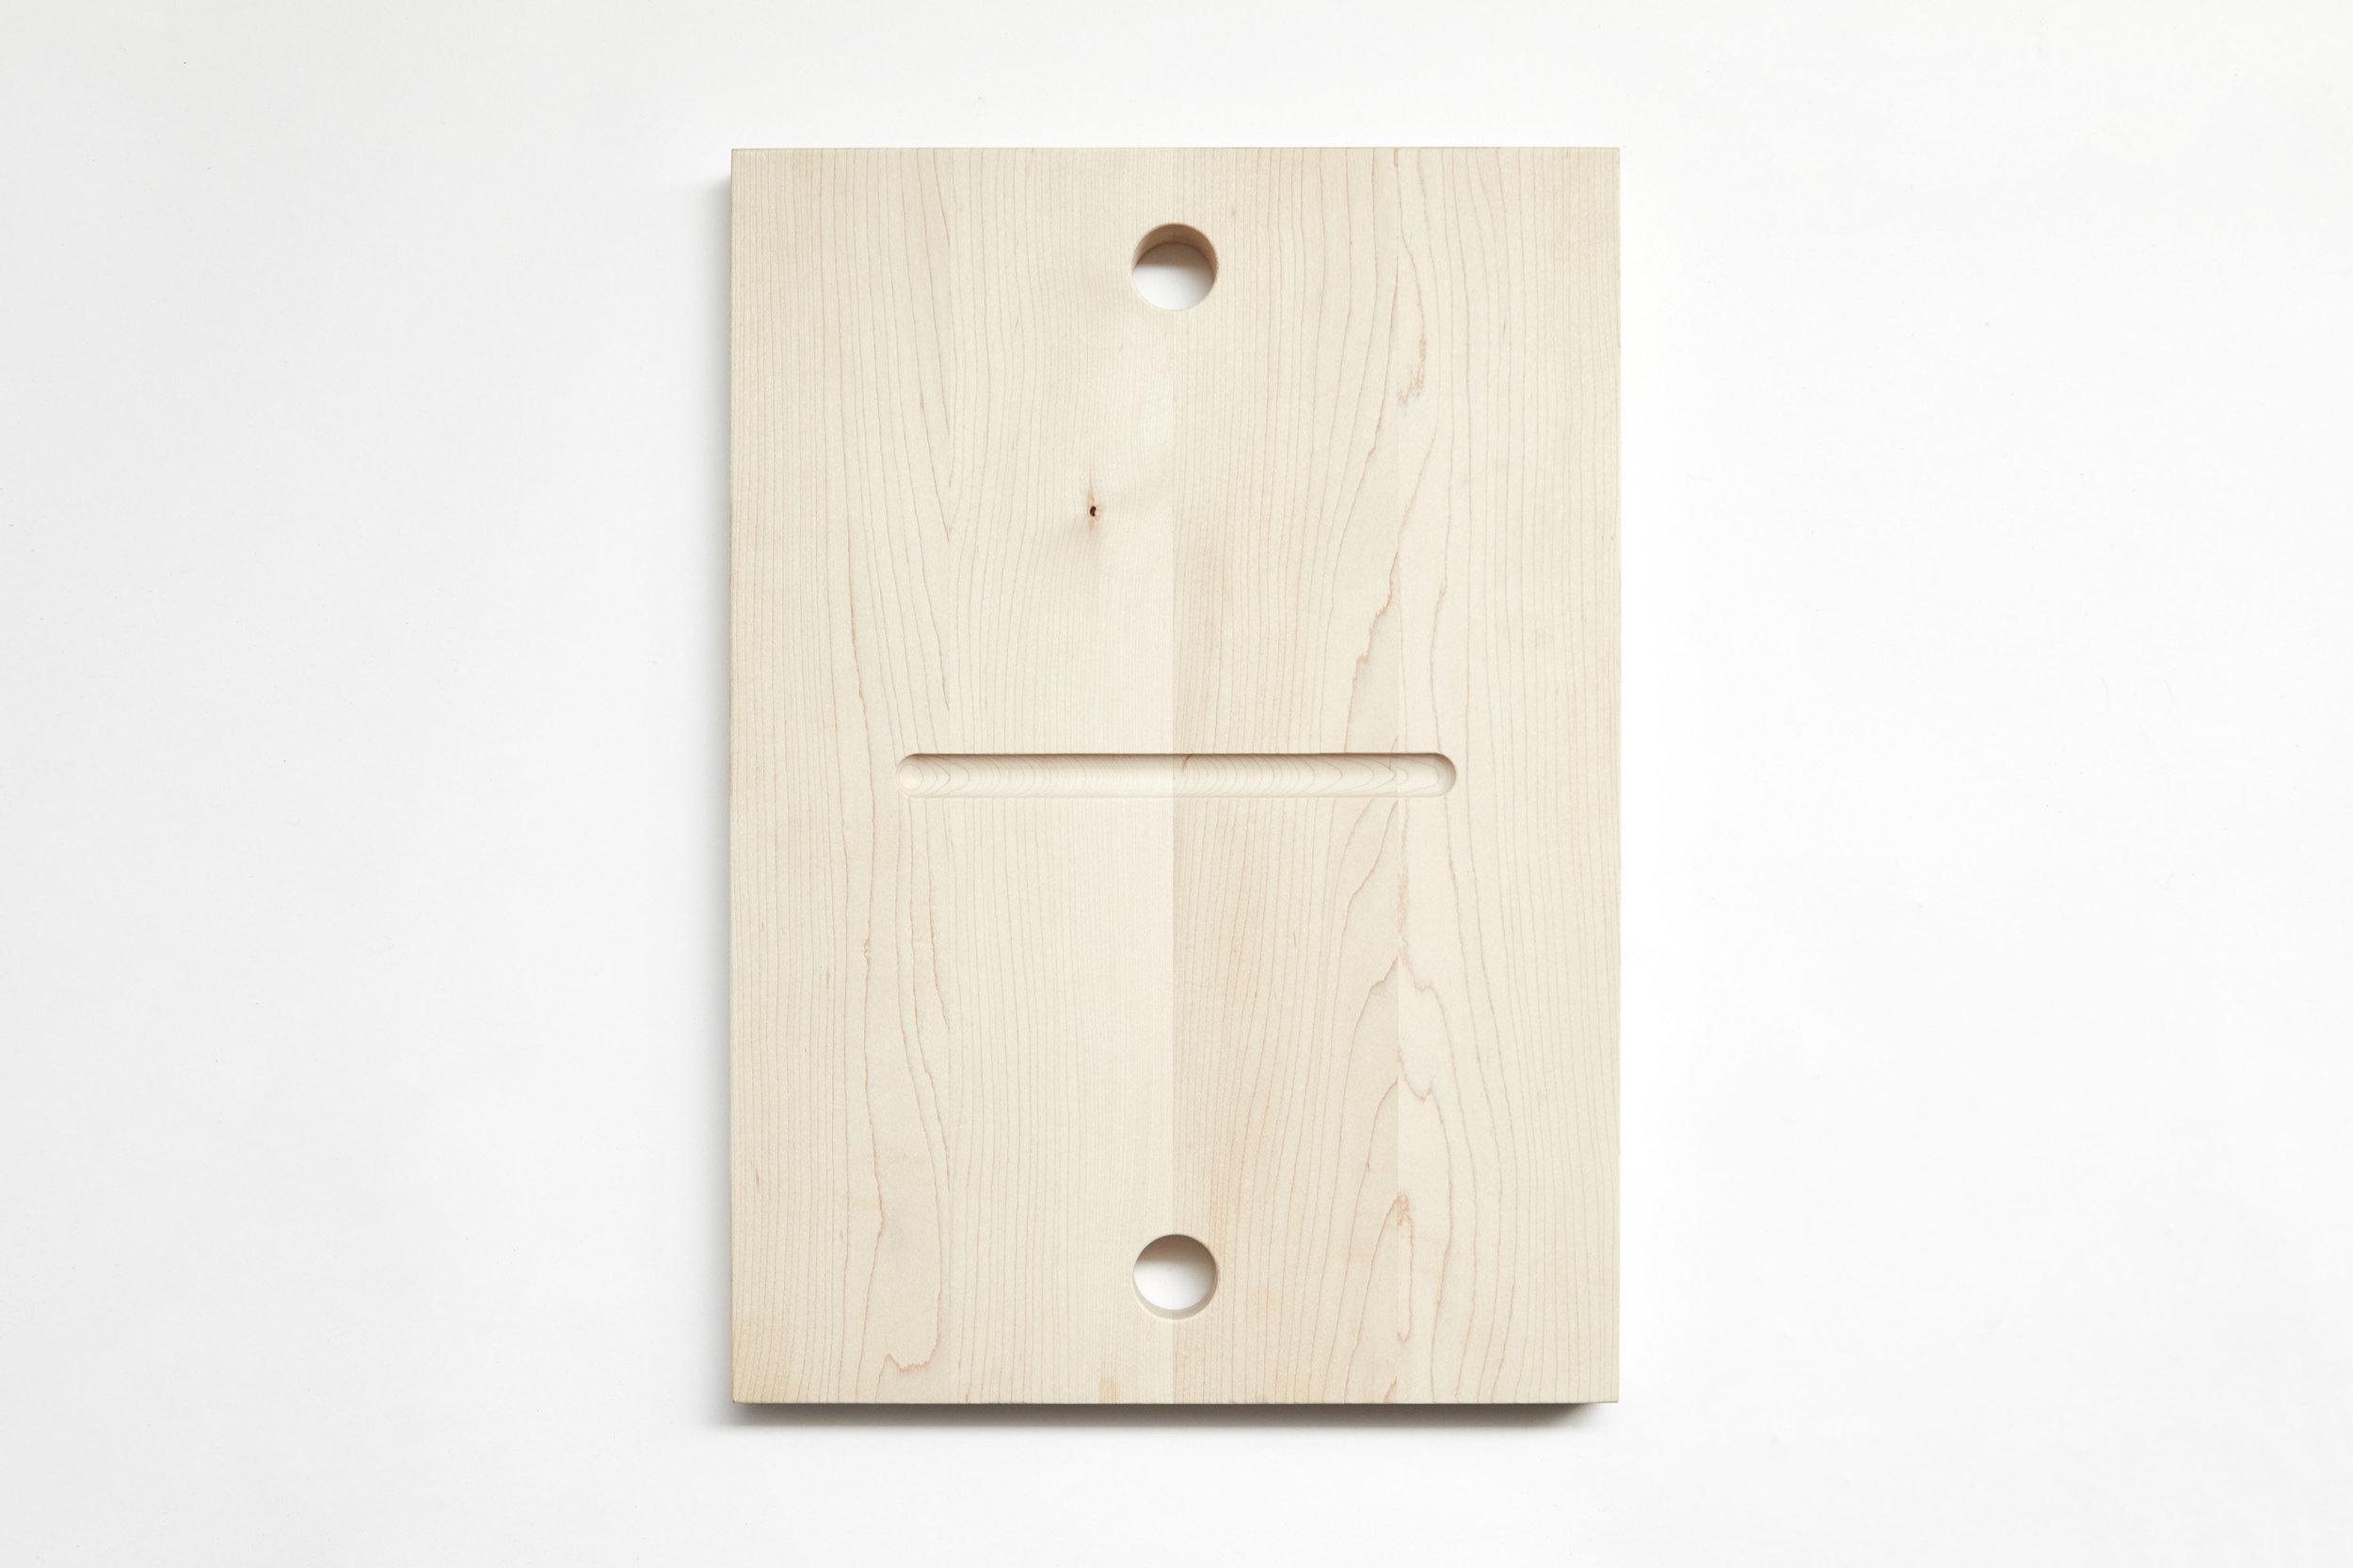 Large-Maple-Chopping-Board_01.jpg